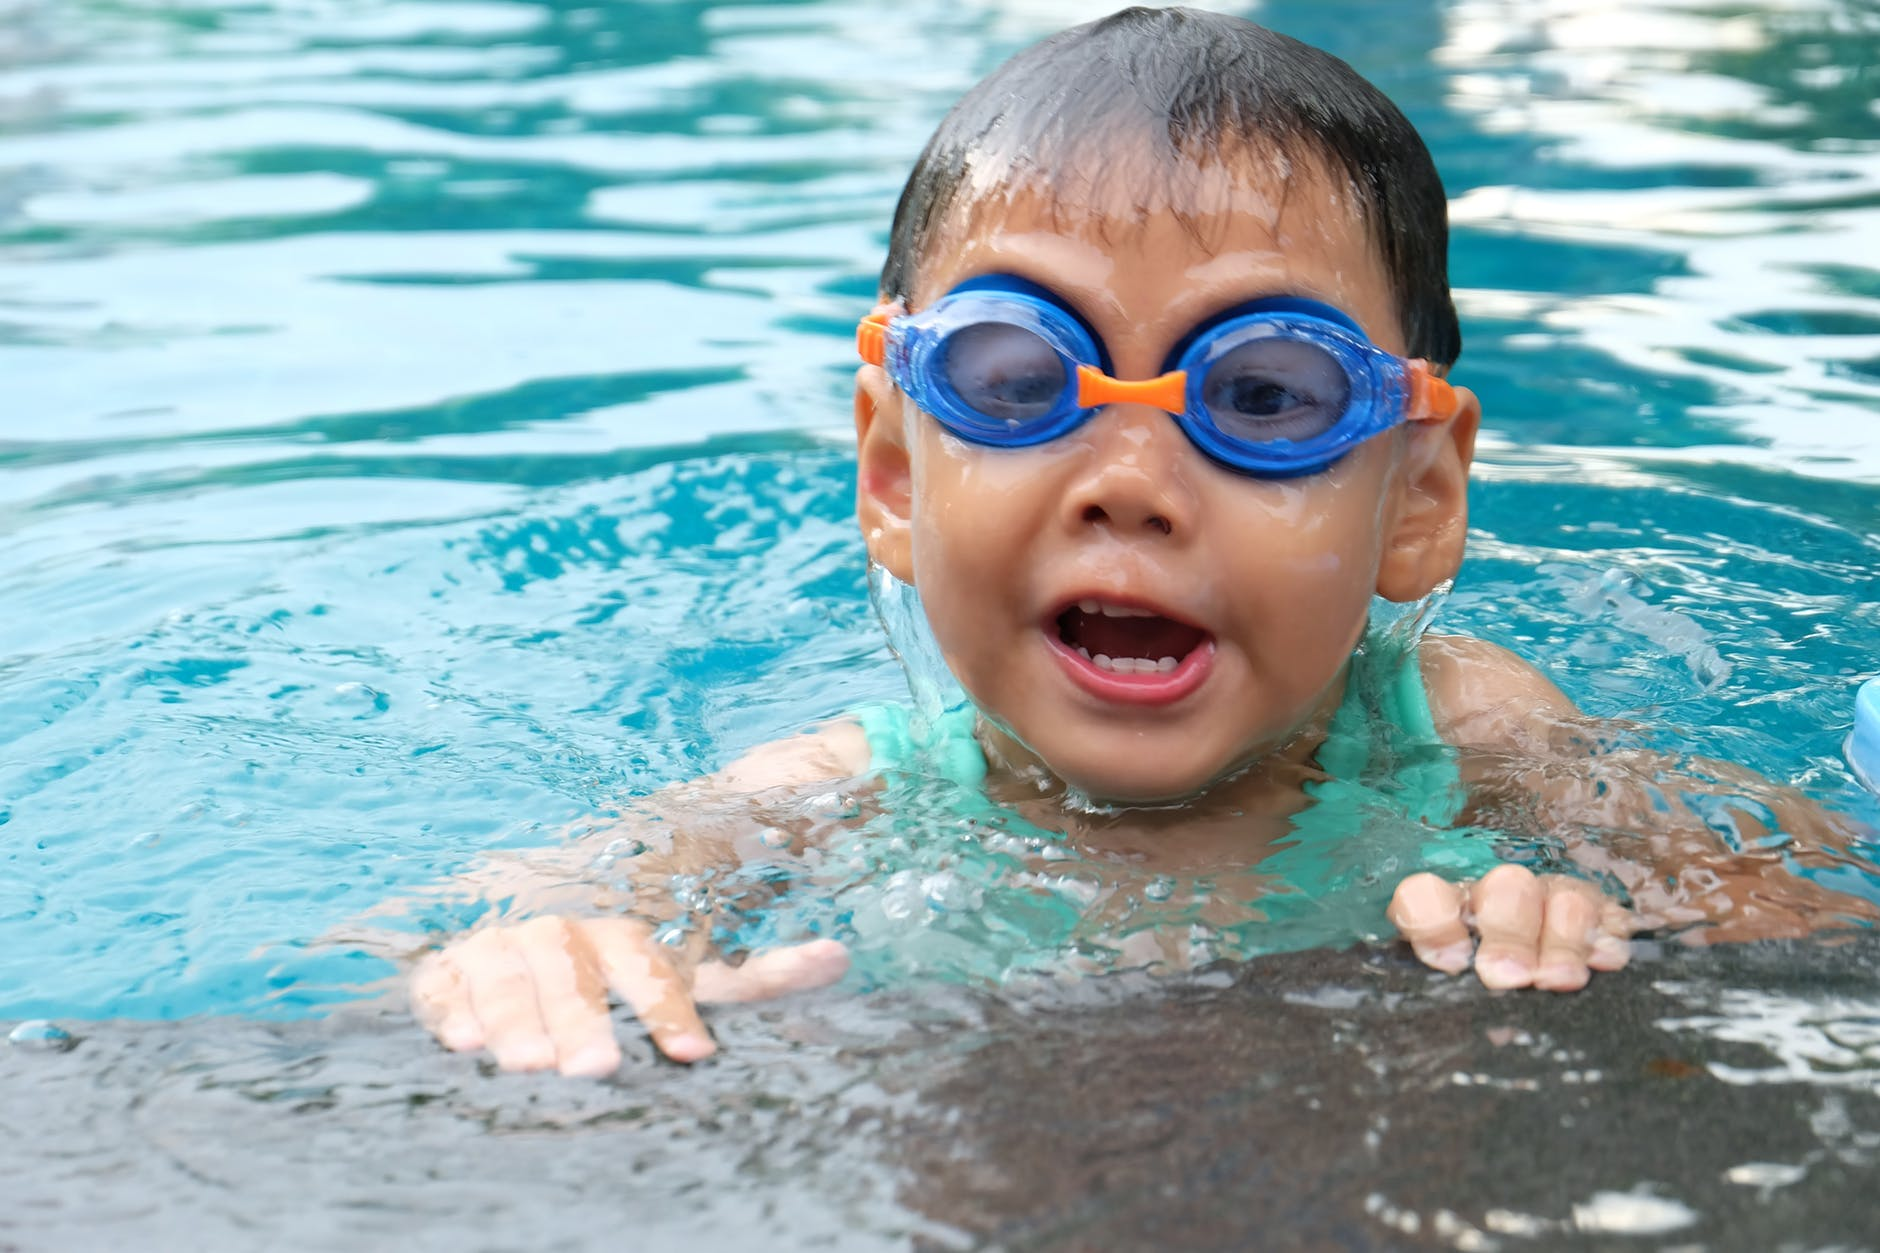 Basic toddler water safety tips